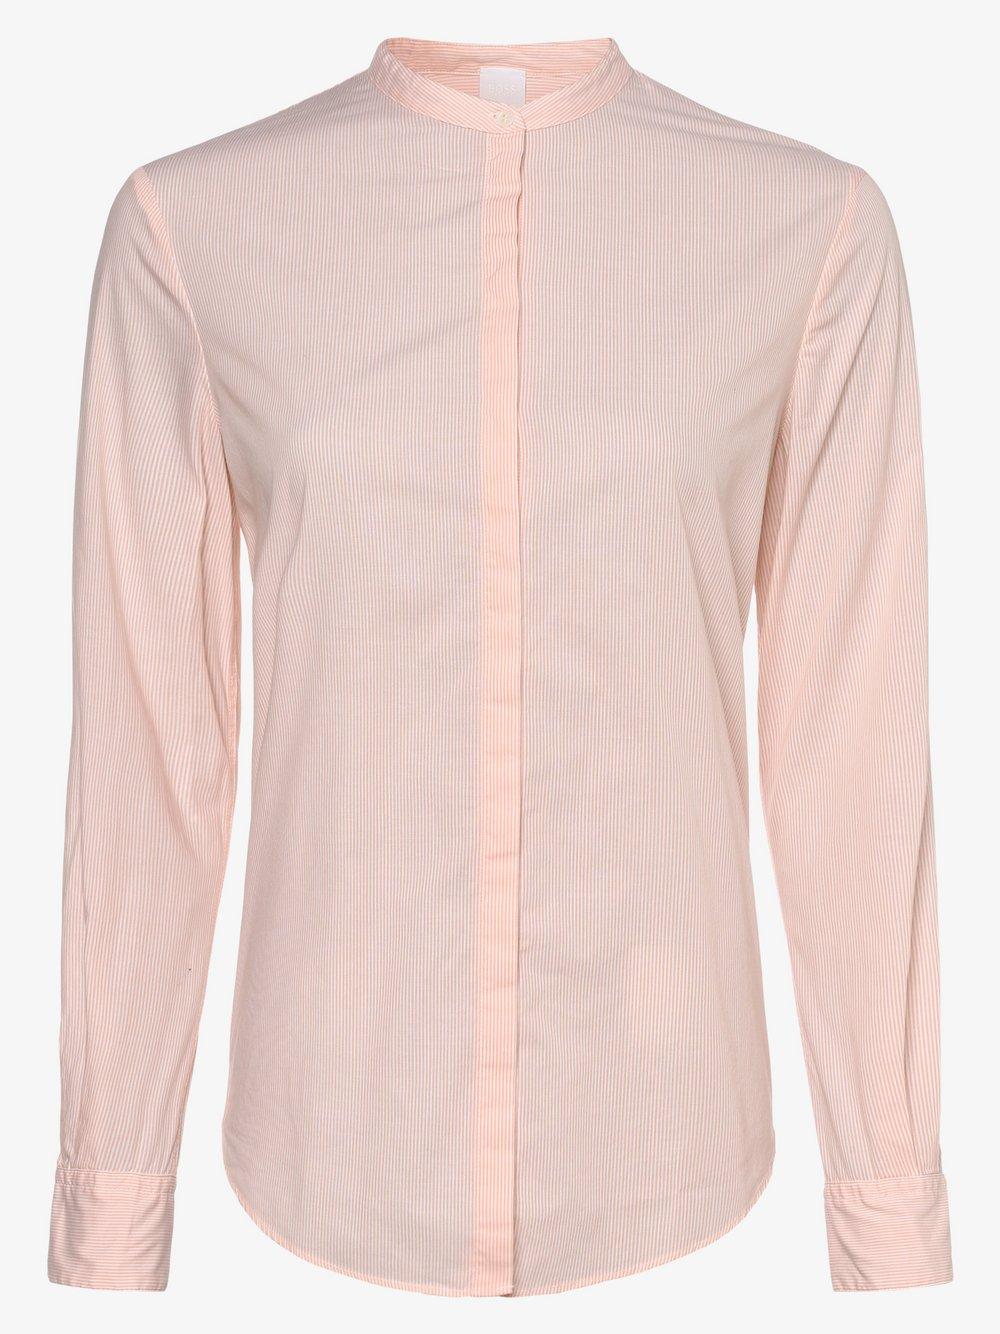 BOSS Casual – Bluzka damska – Efelize_17, różowy Van Graaf 461094-0001-00380